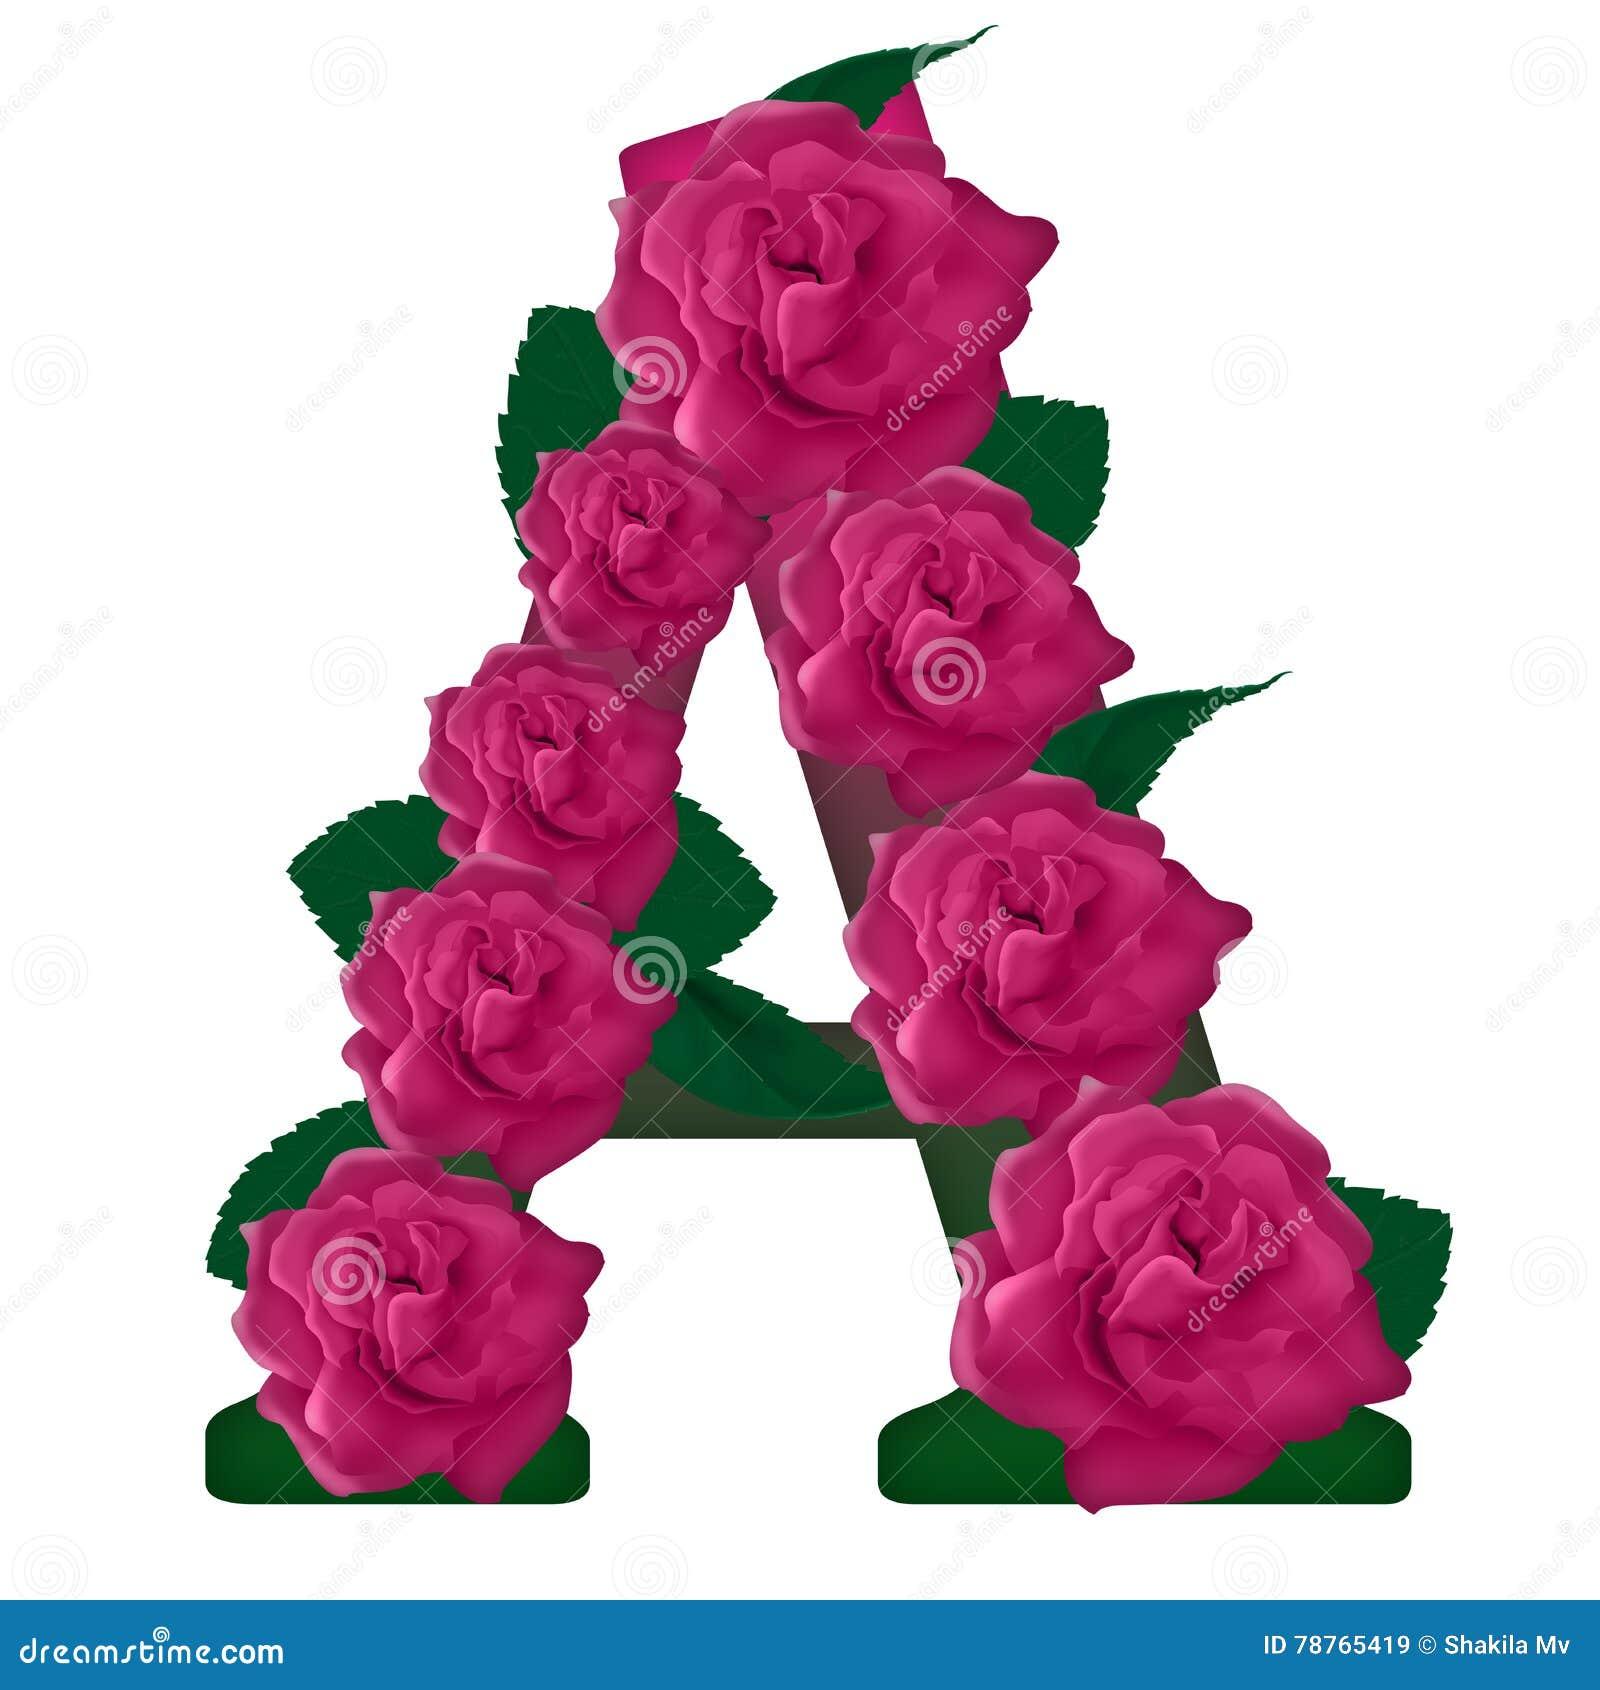 Letter A Cute Flower Illustration Stock Image   Illustration of